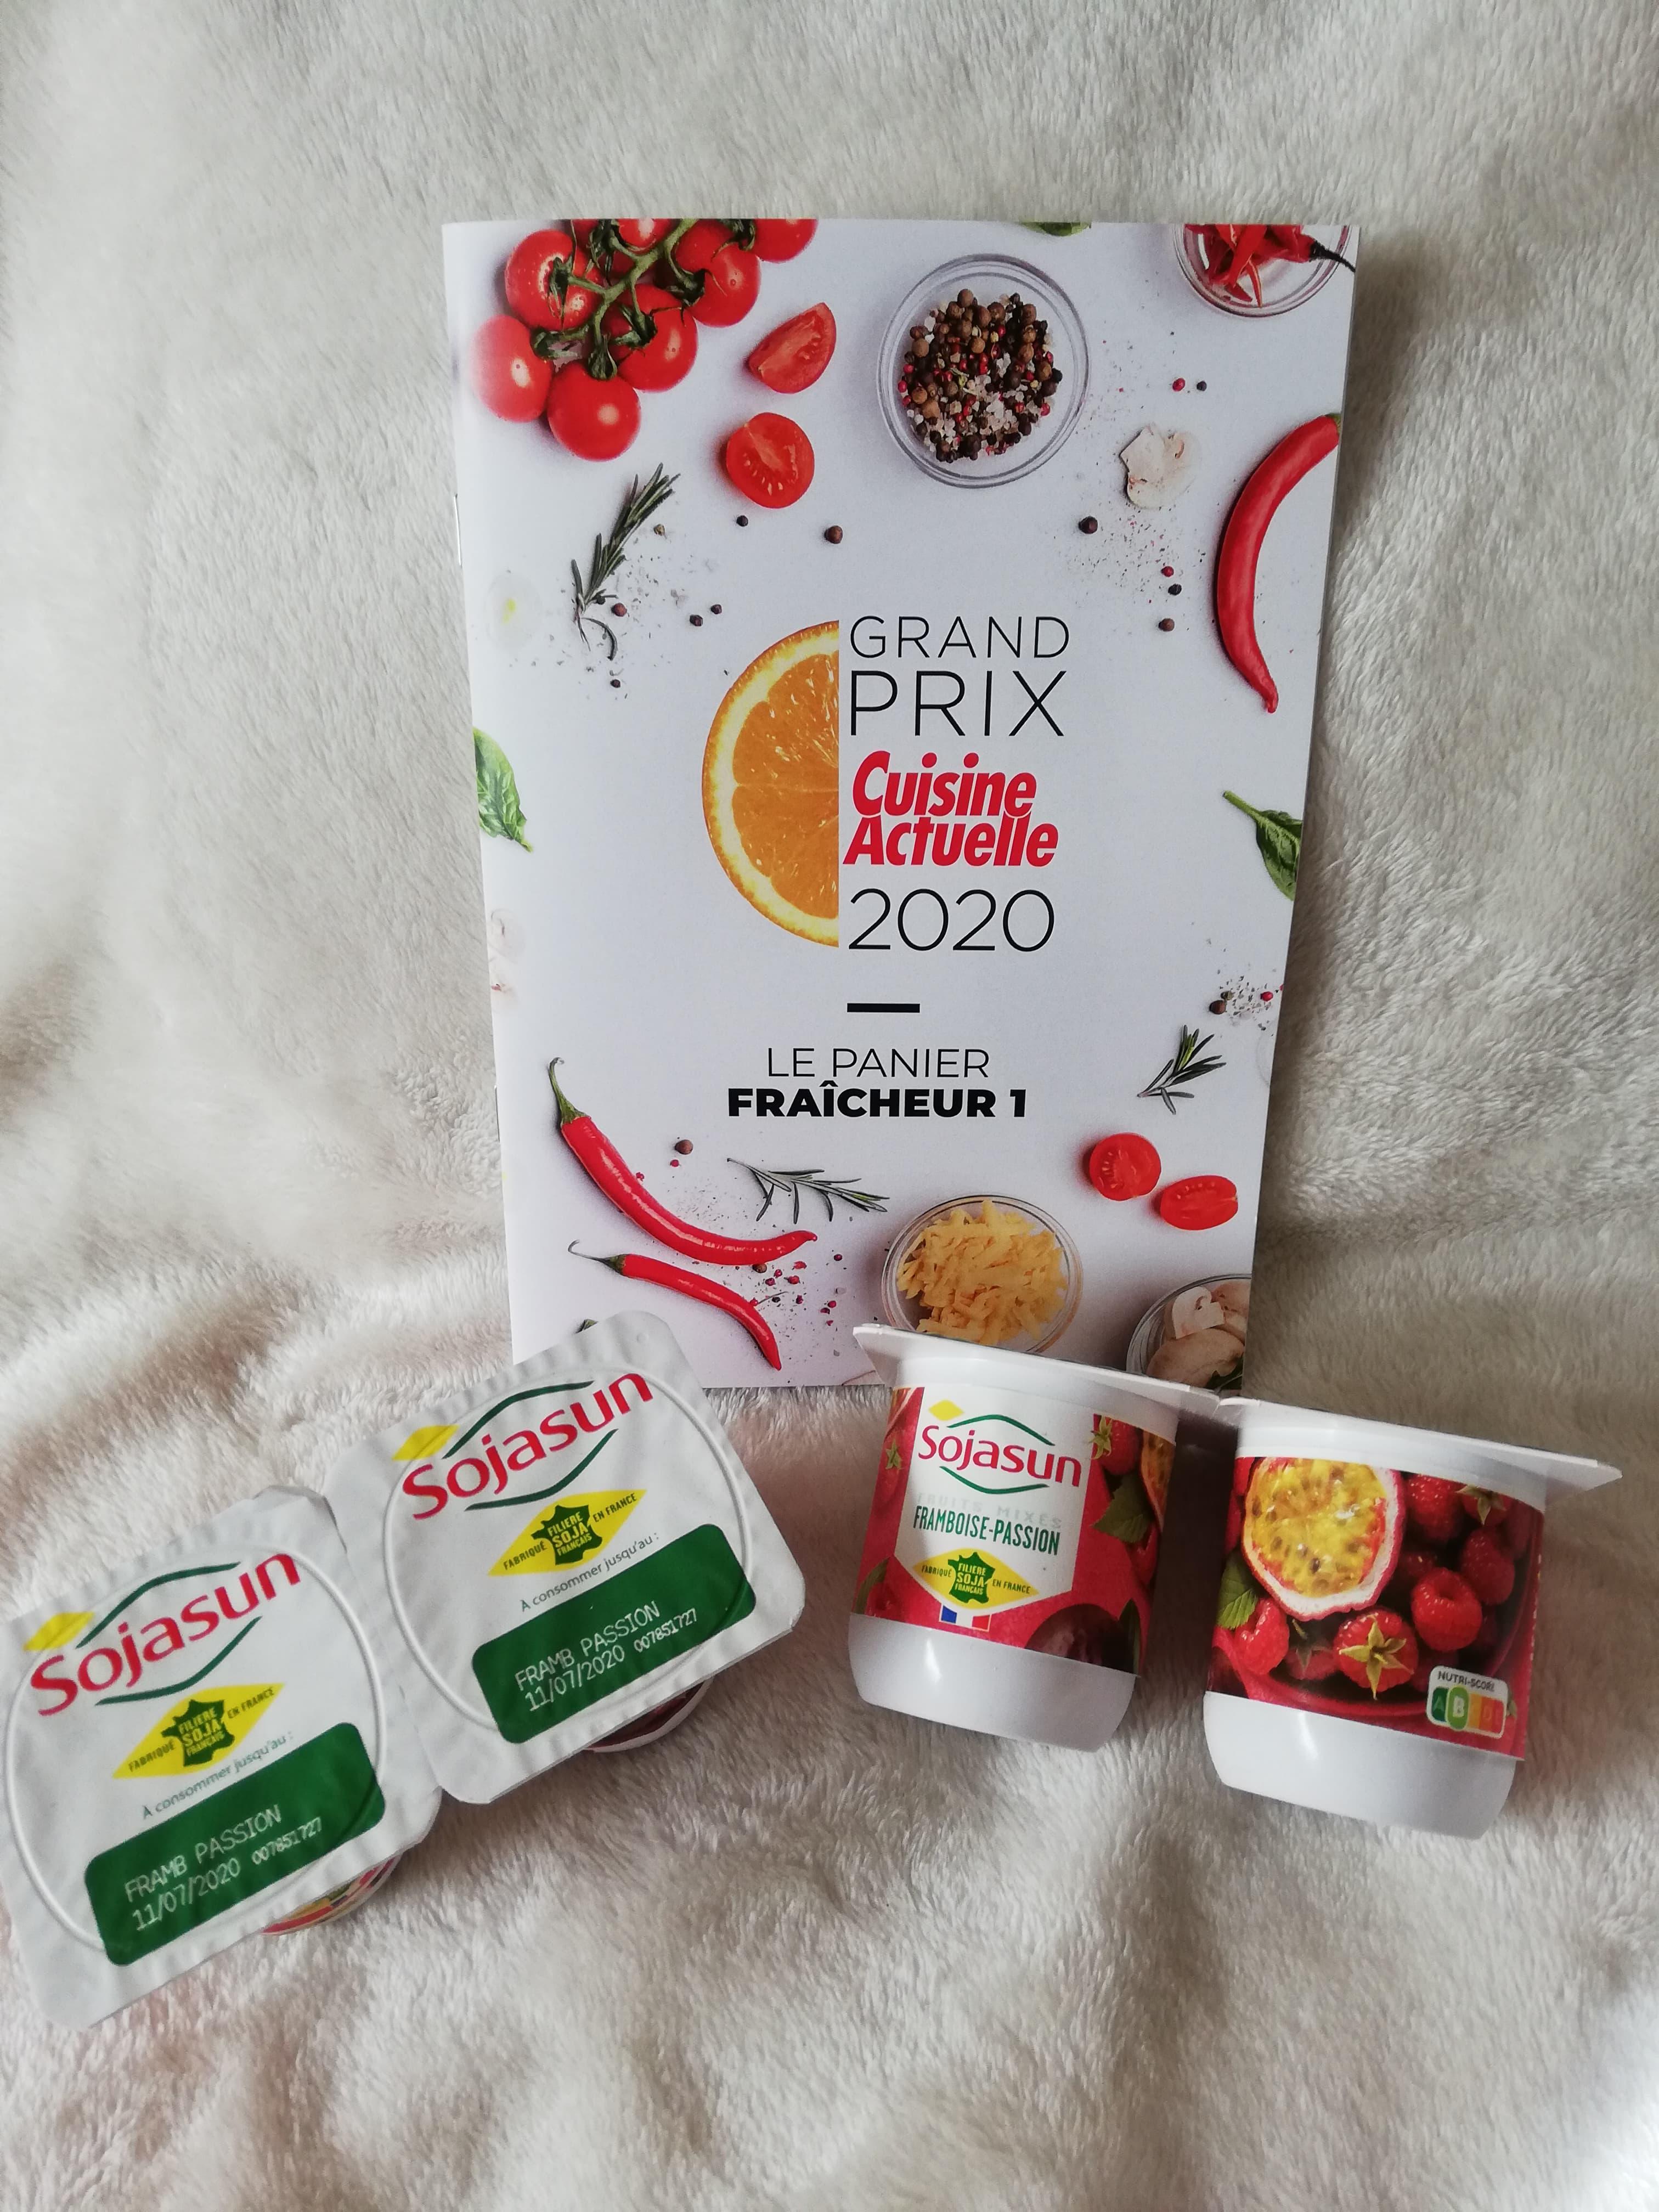 Sojasun Framboise - Passion (prix moyen conseillé 1,65 €)